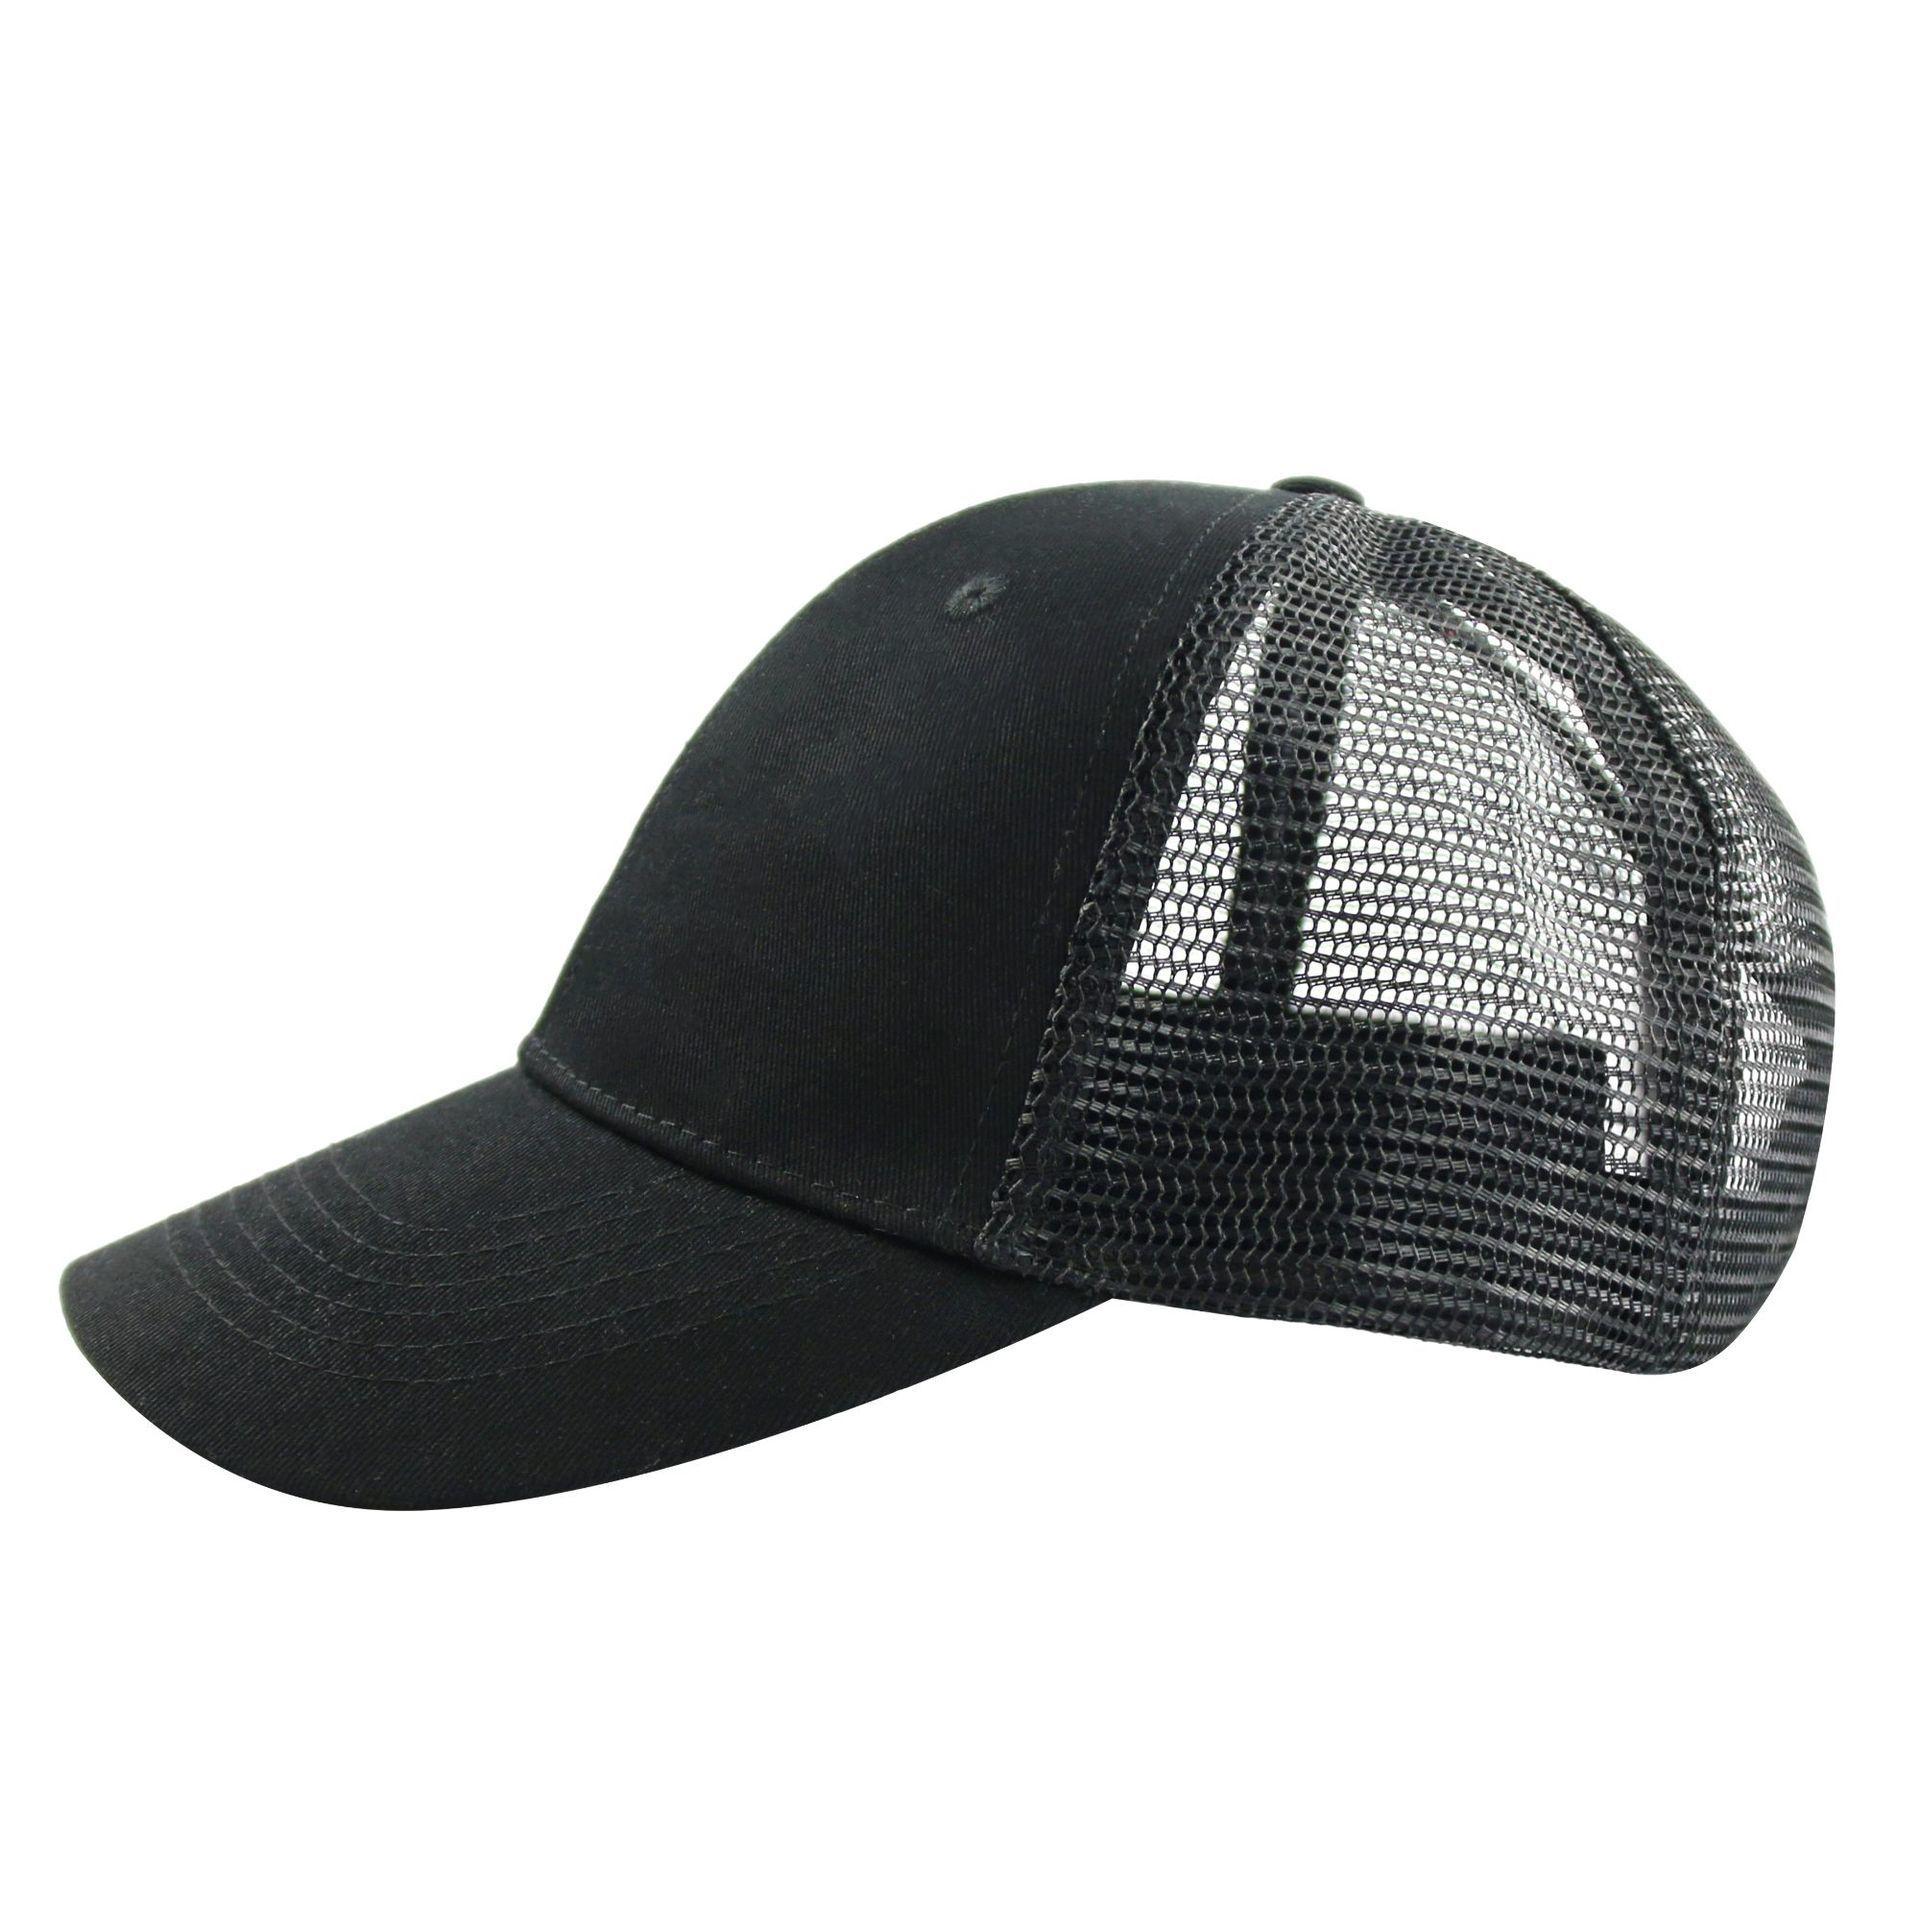 New Baseball Men's Fashionable Cap